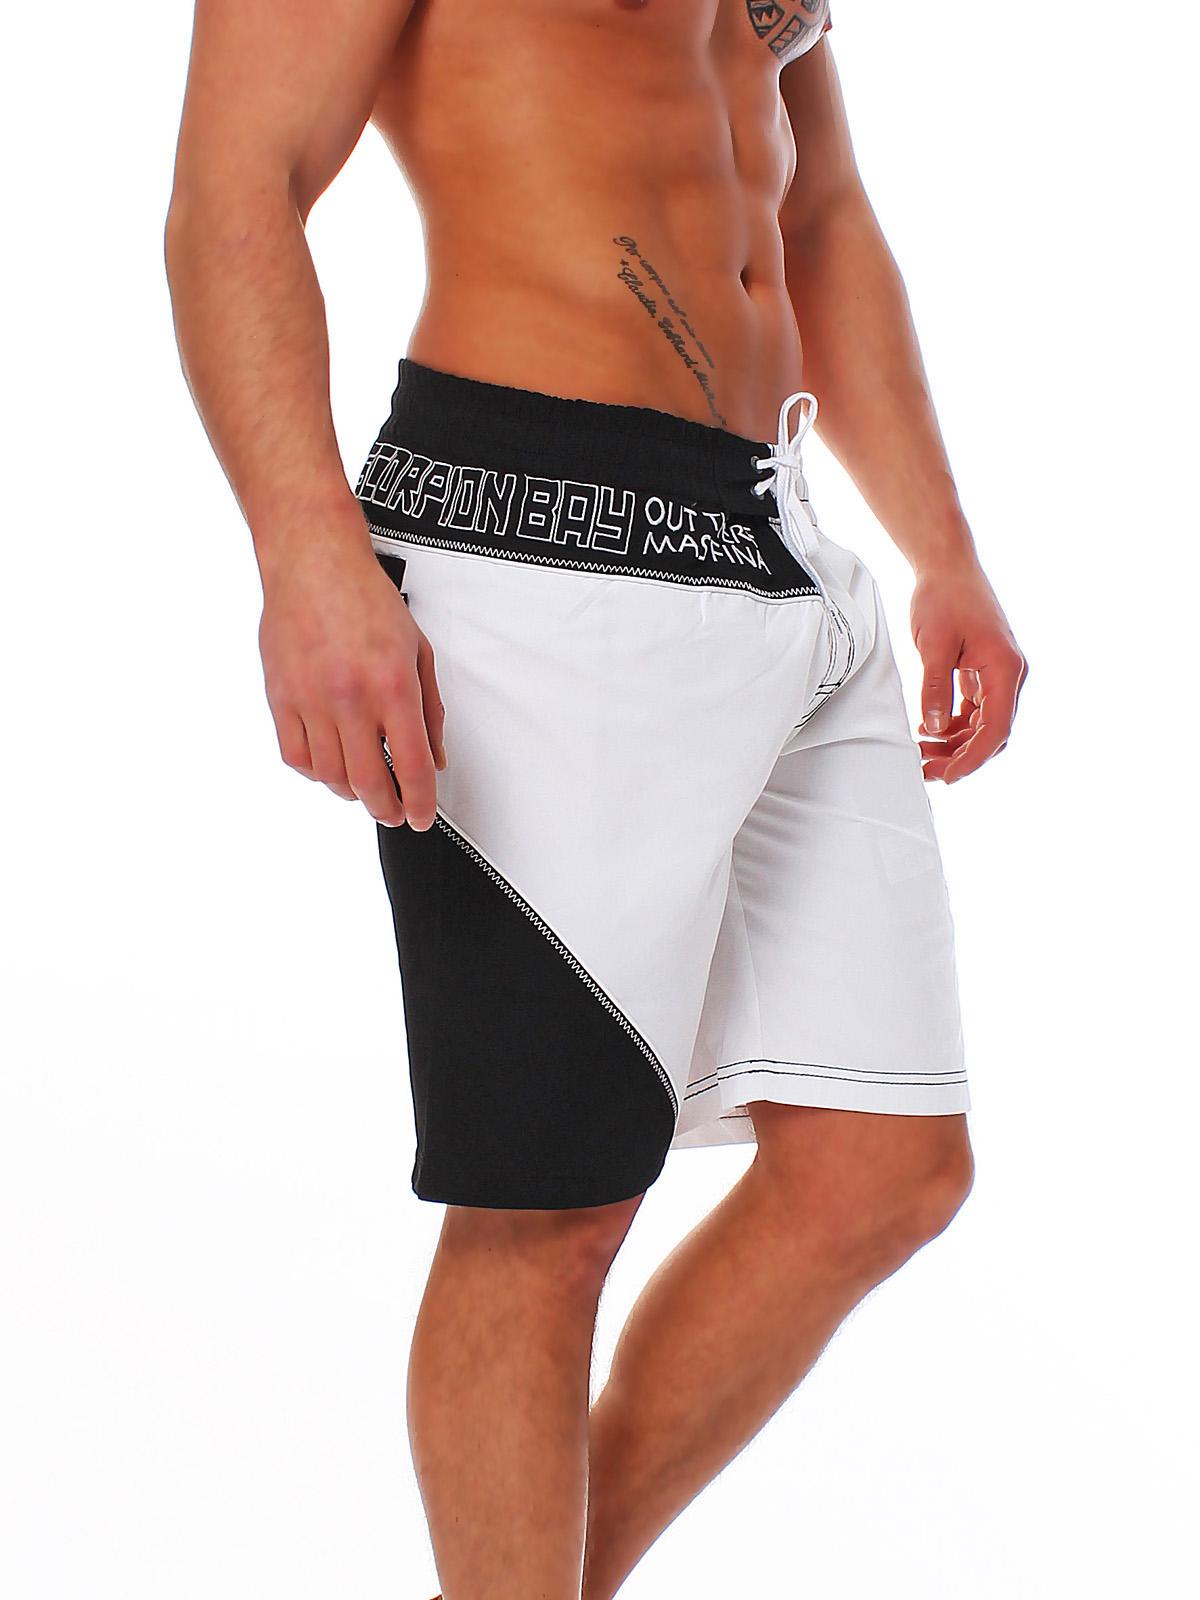 Scorpion bay bagno maschile hort short calzoncini da bagno board short jam 2926 ebay - Uomini in costume da bagno ...